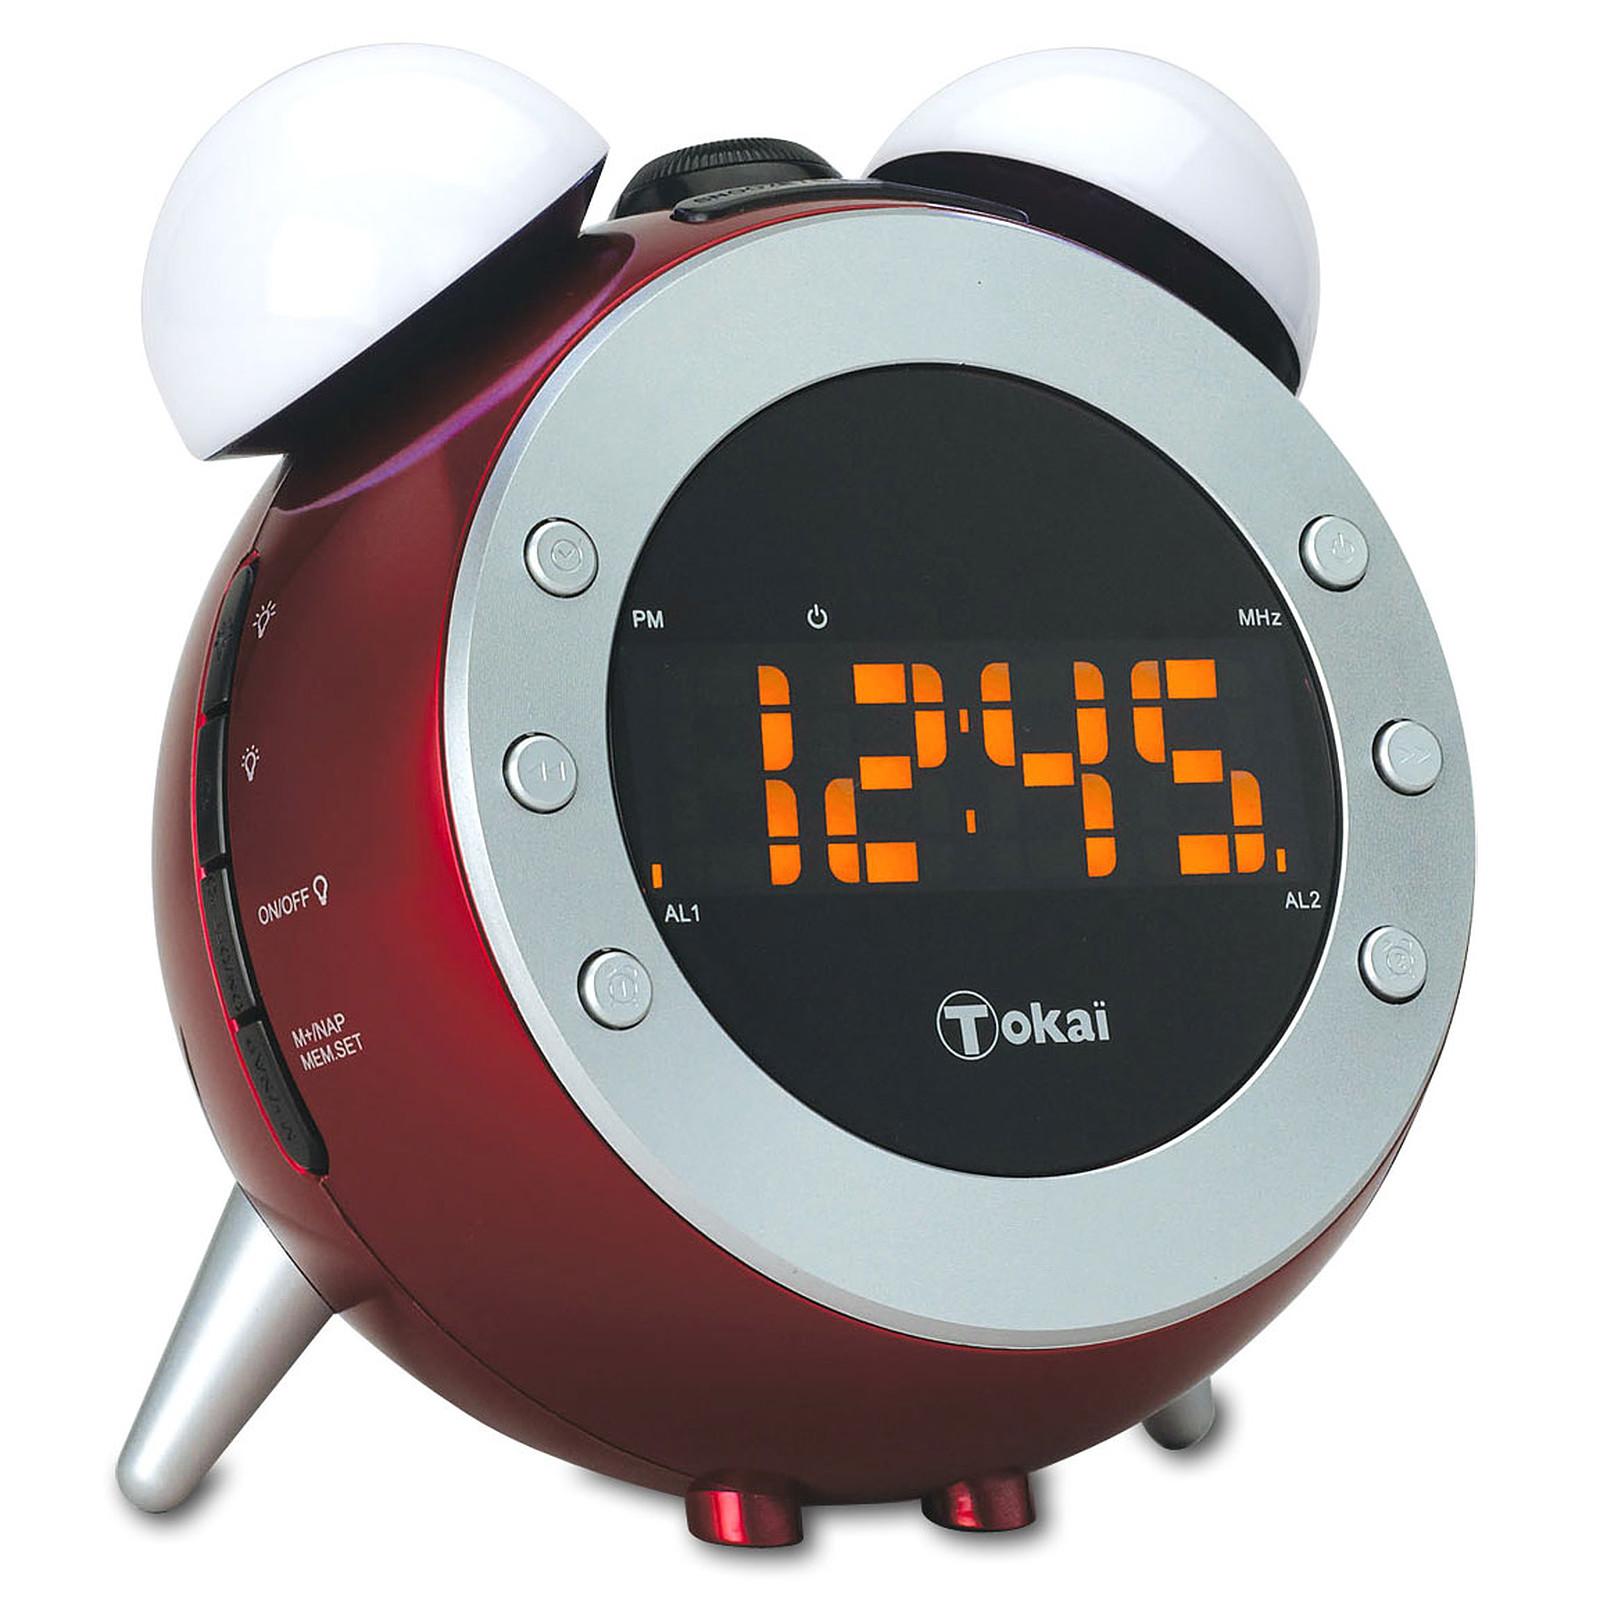 Tokai TCP 124 Rouge Radio & radio réveil Tokaï sur LDLC